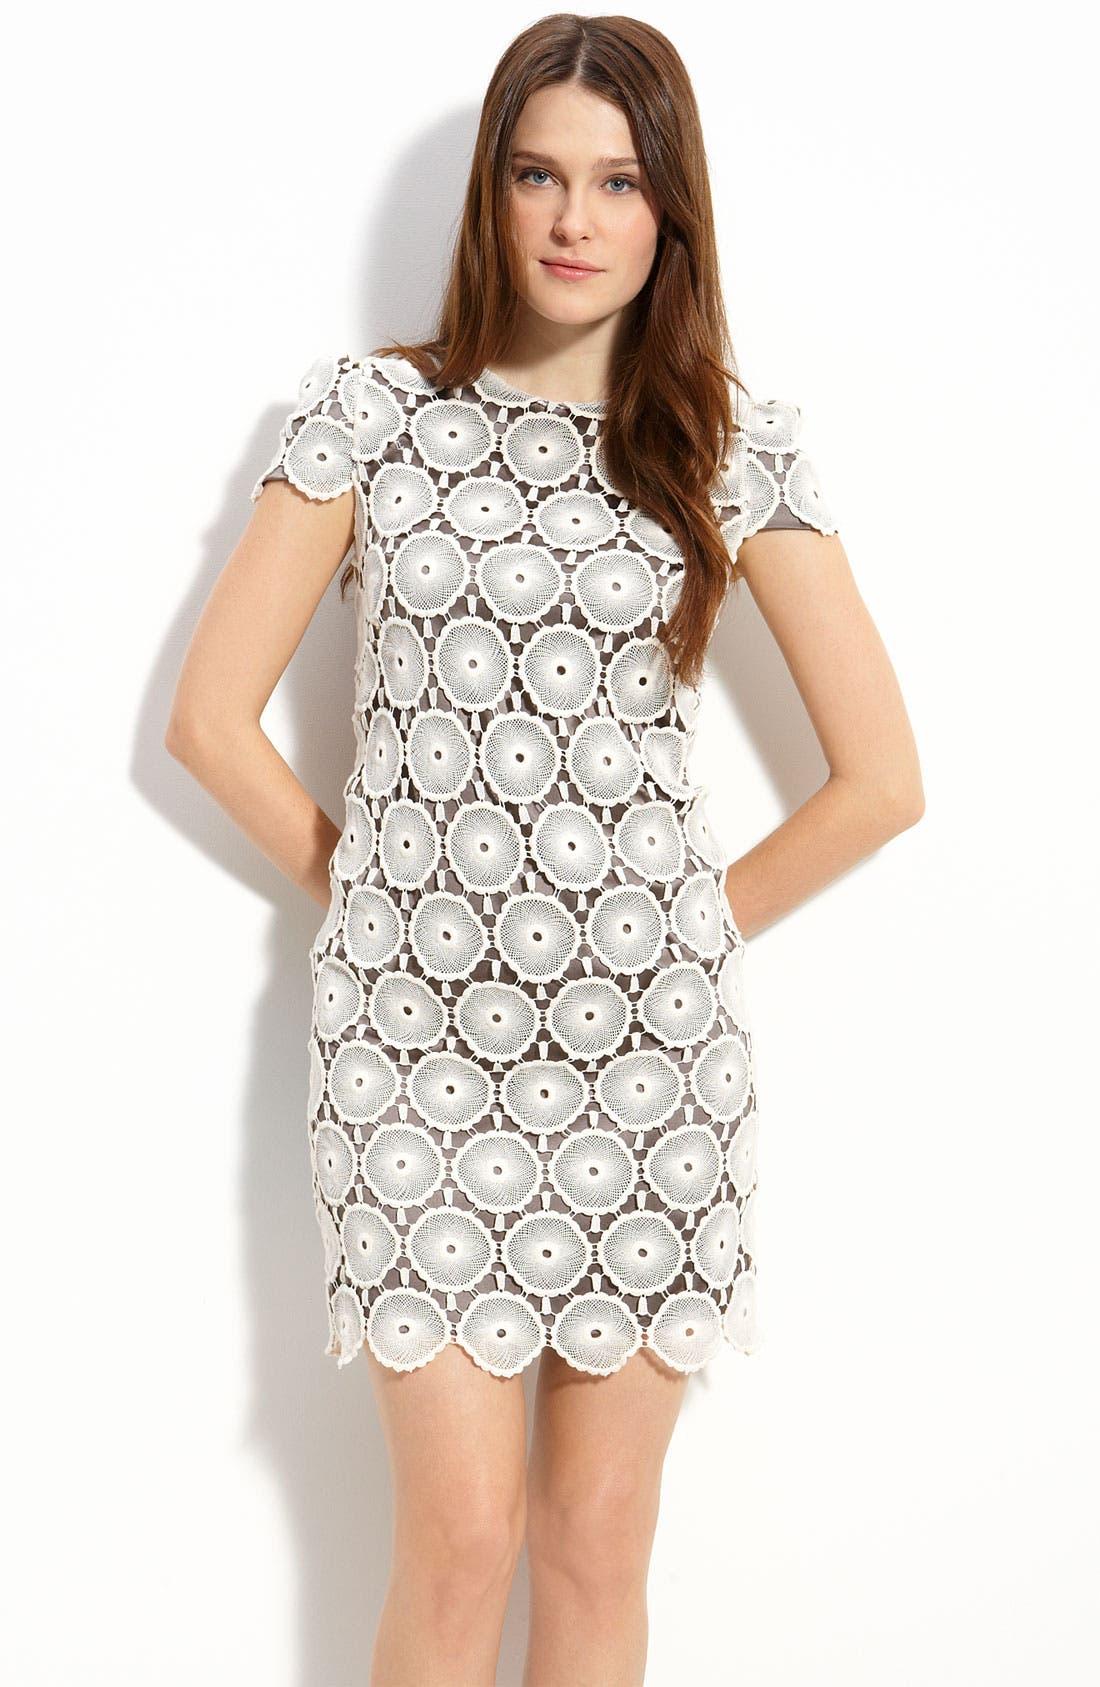 Main Image - Suzi Chin for Maggy Boutique Lace Shift Dress